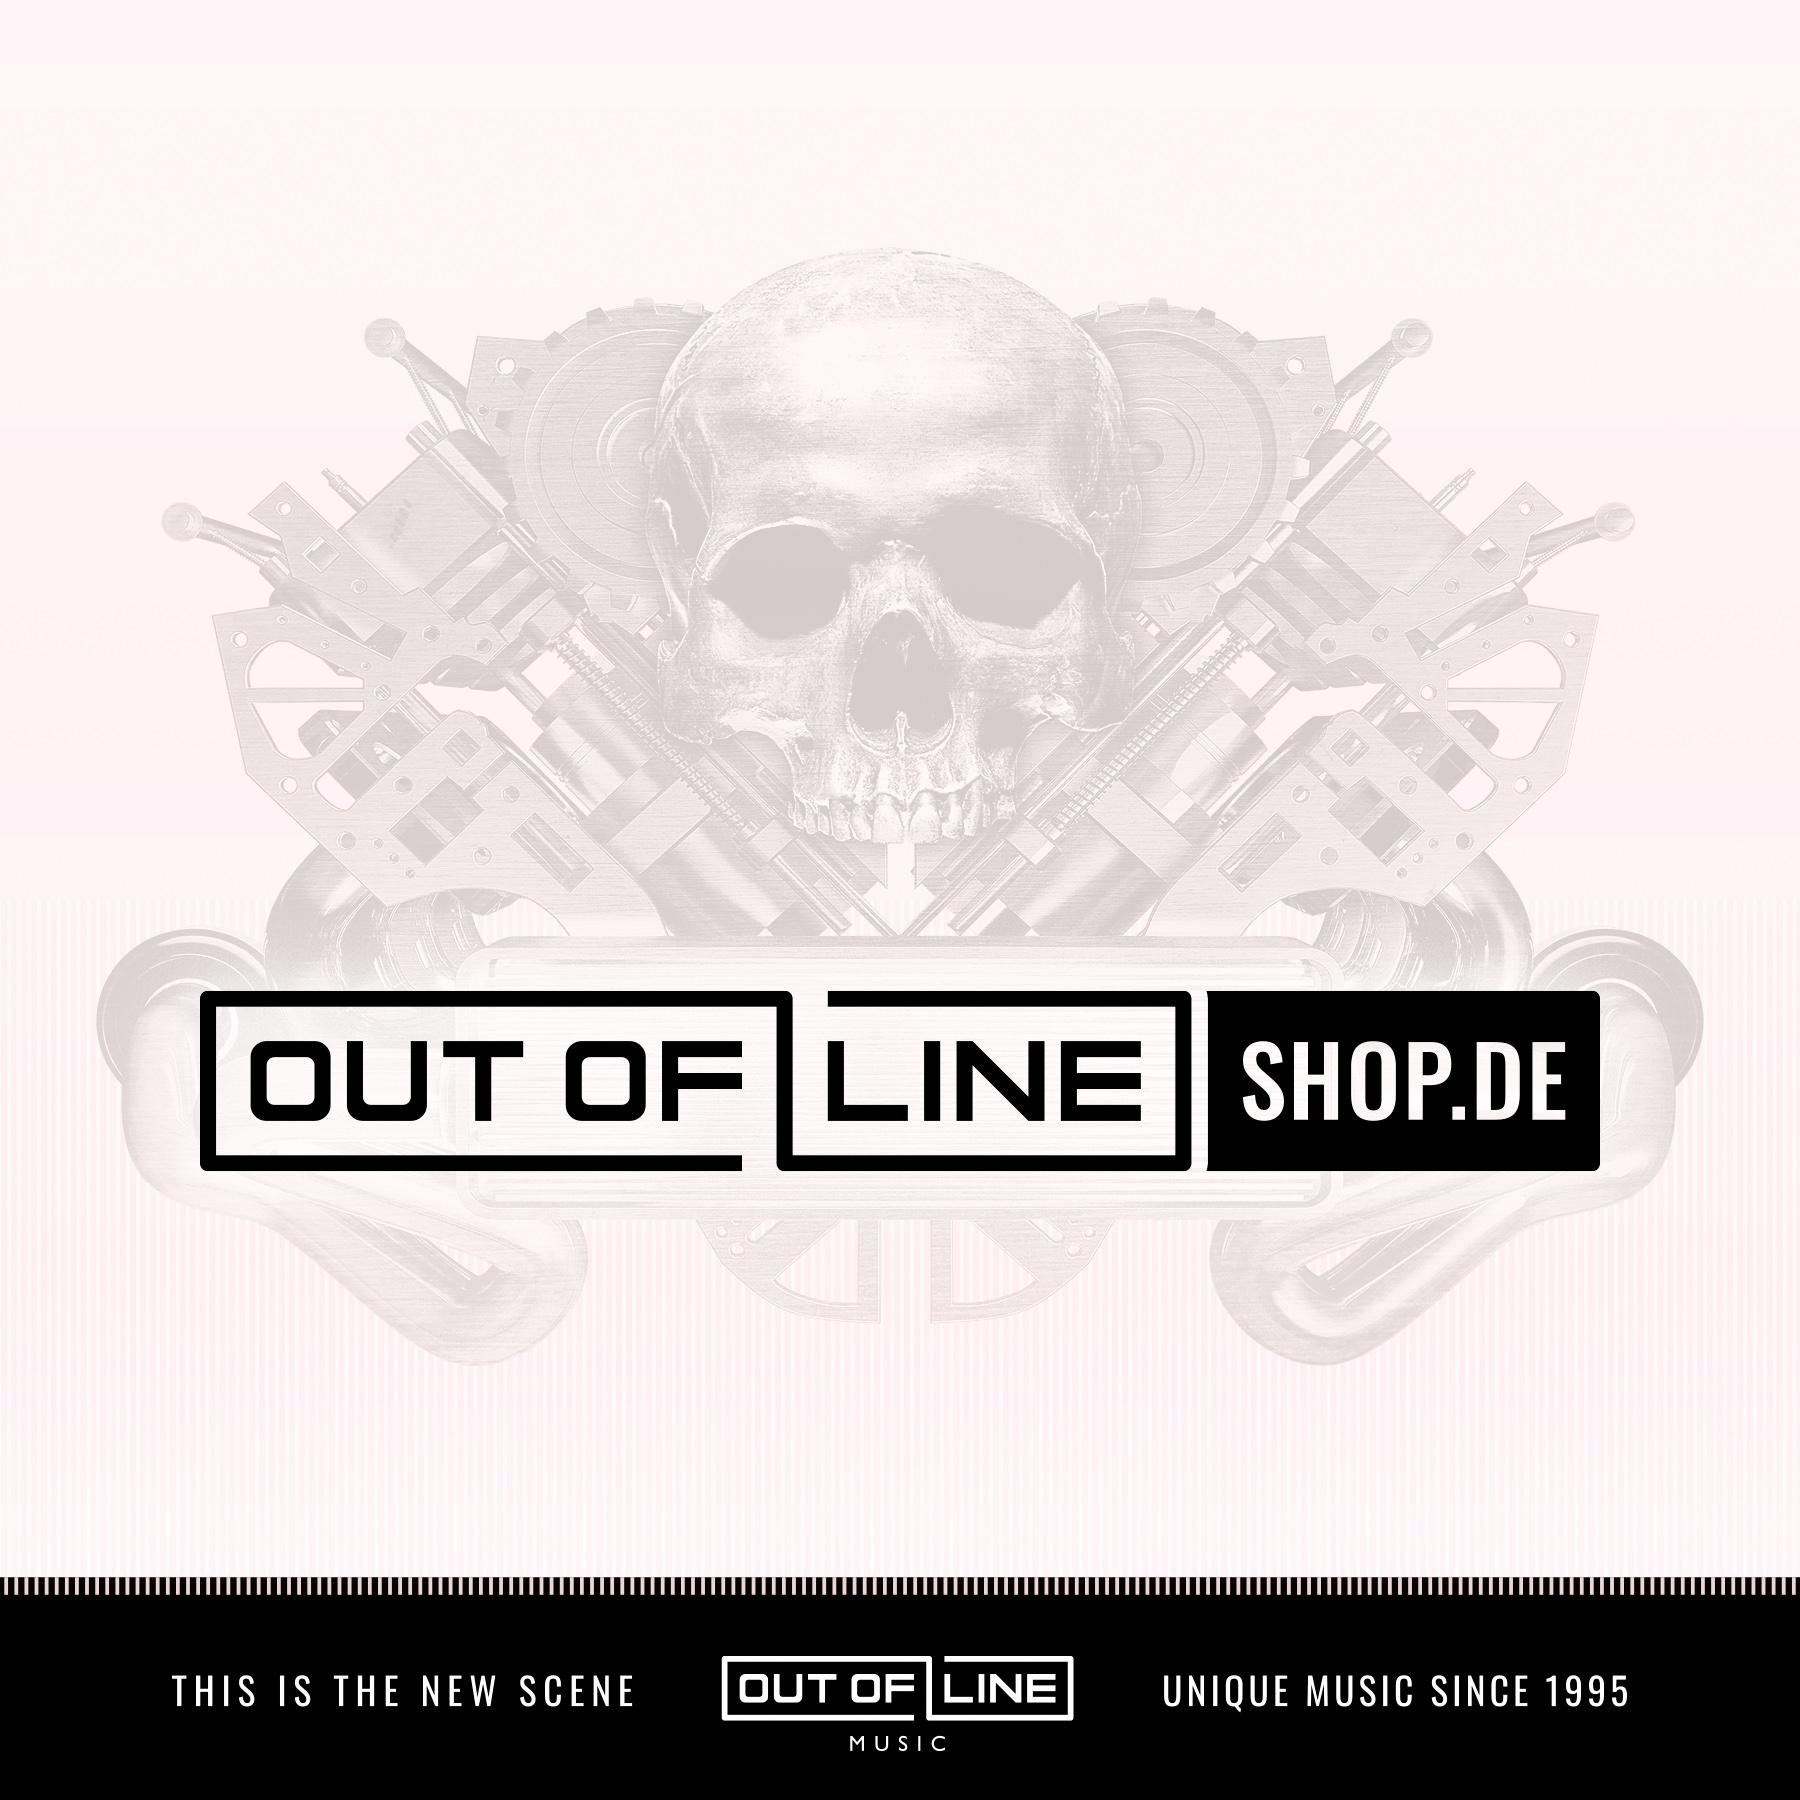 Erdling - Helheim (Limited Box Set) - Rucksack/T-Shirt Bundle